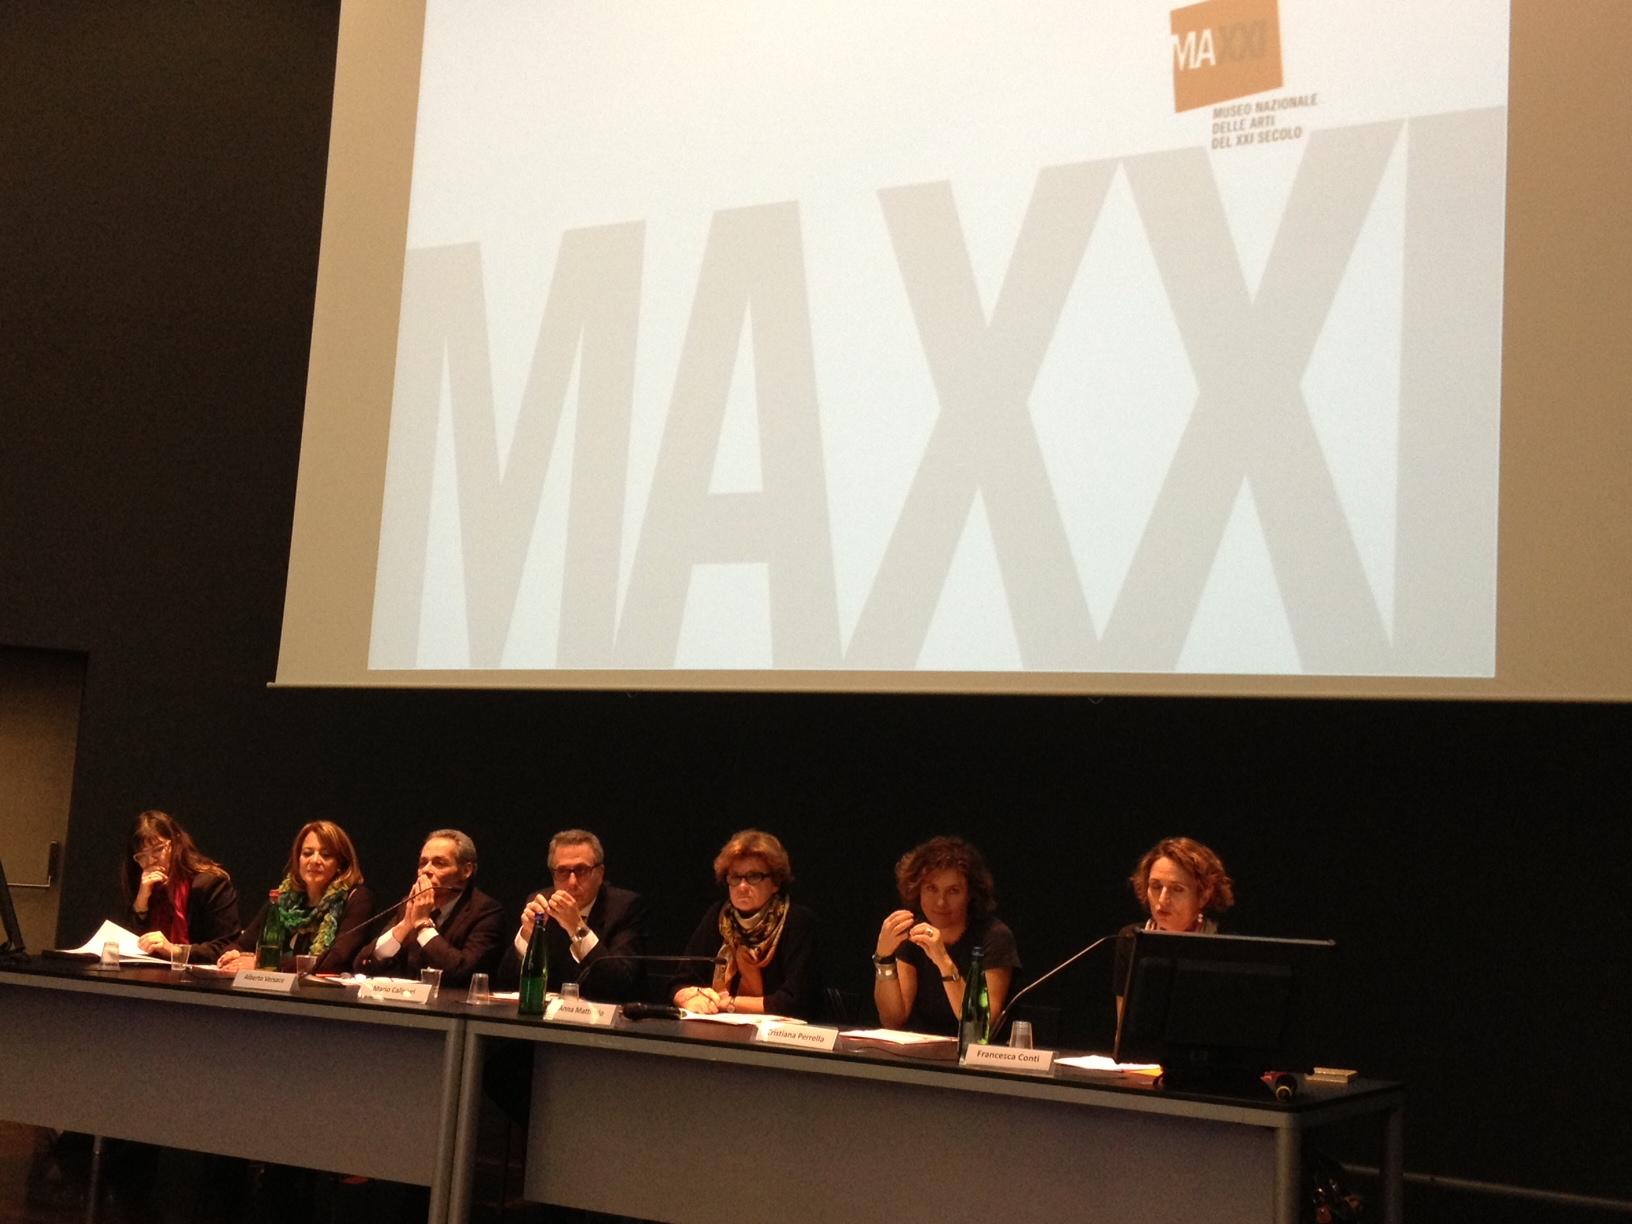 conferenza al maxxi